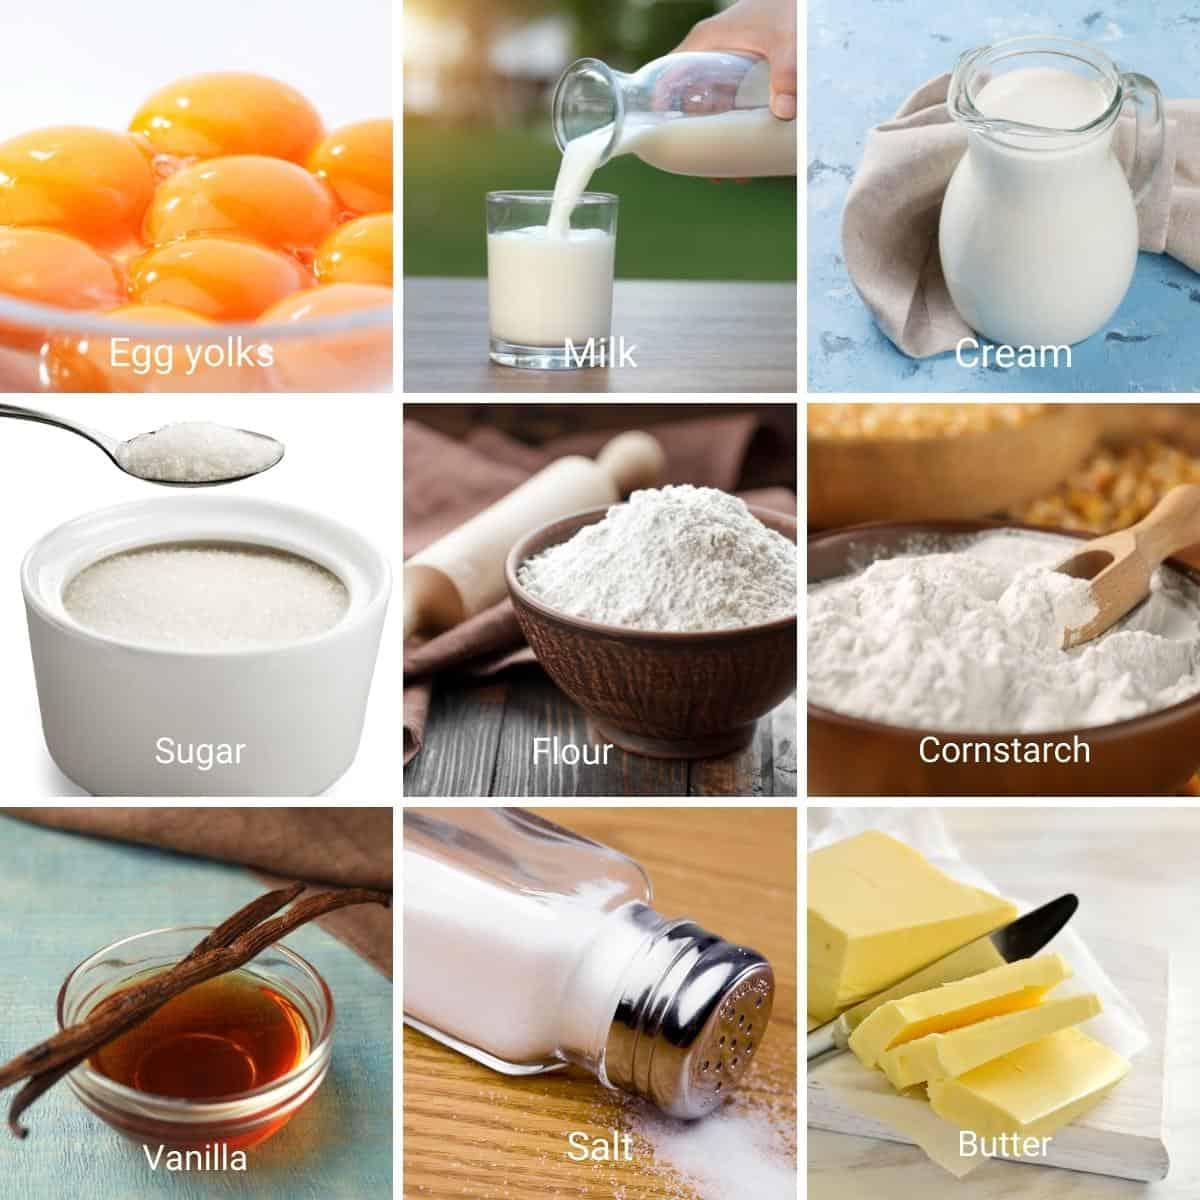 Ingredients for making German Buttercream.